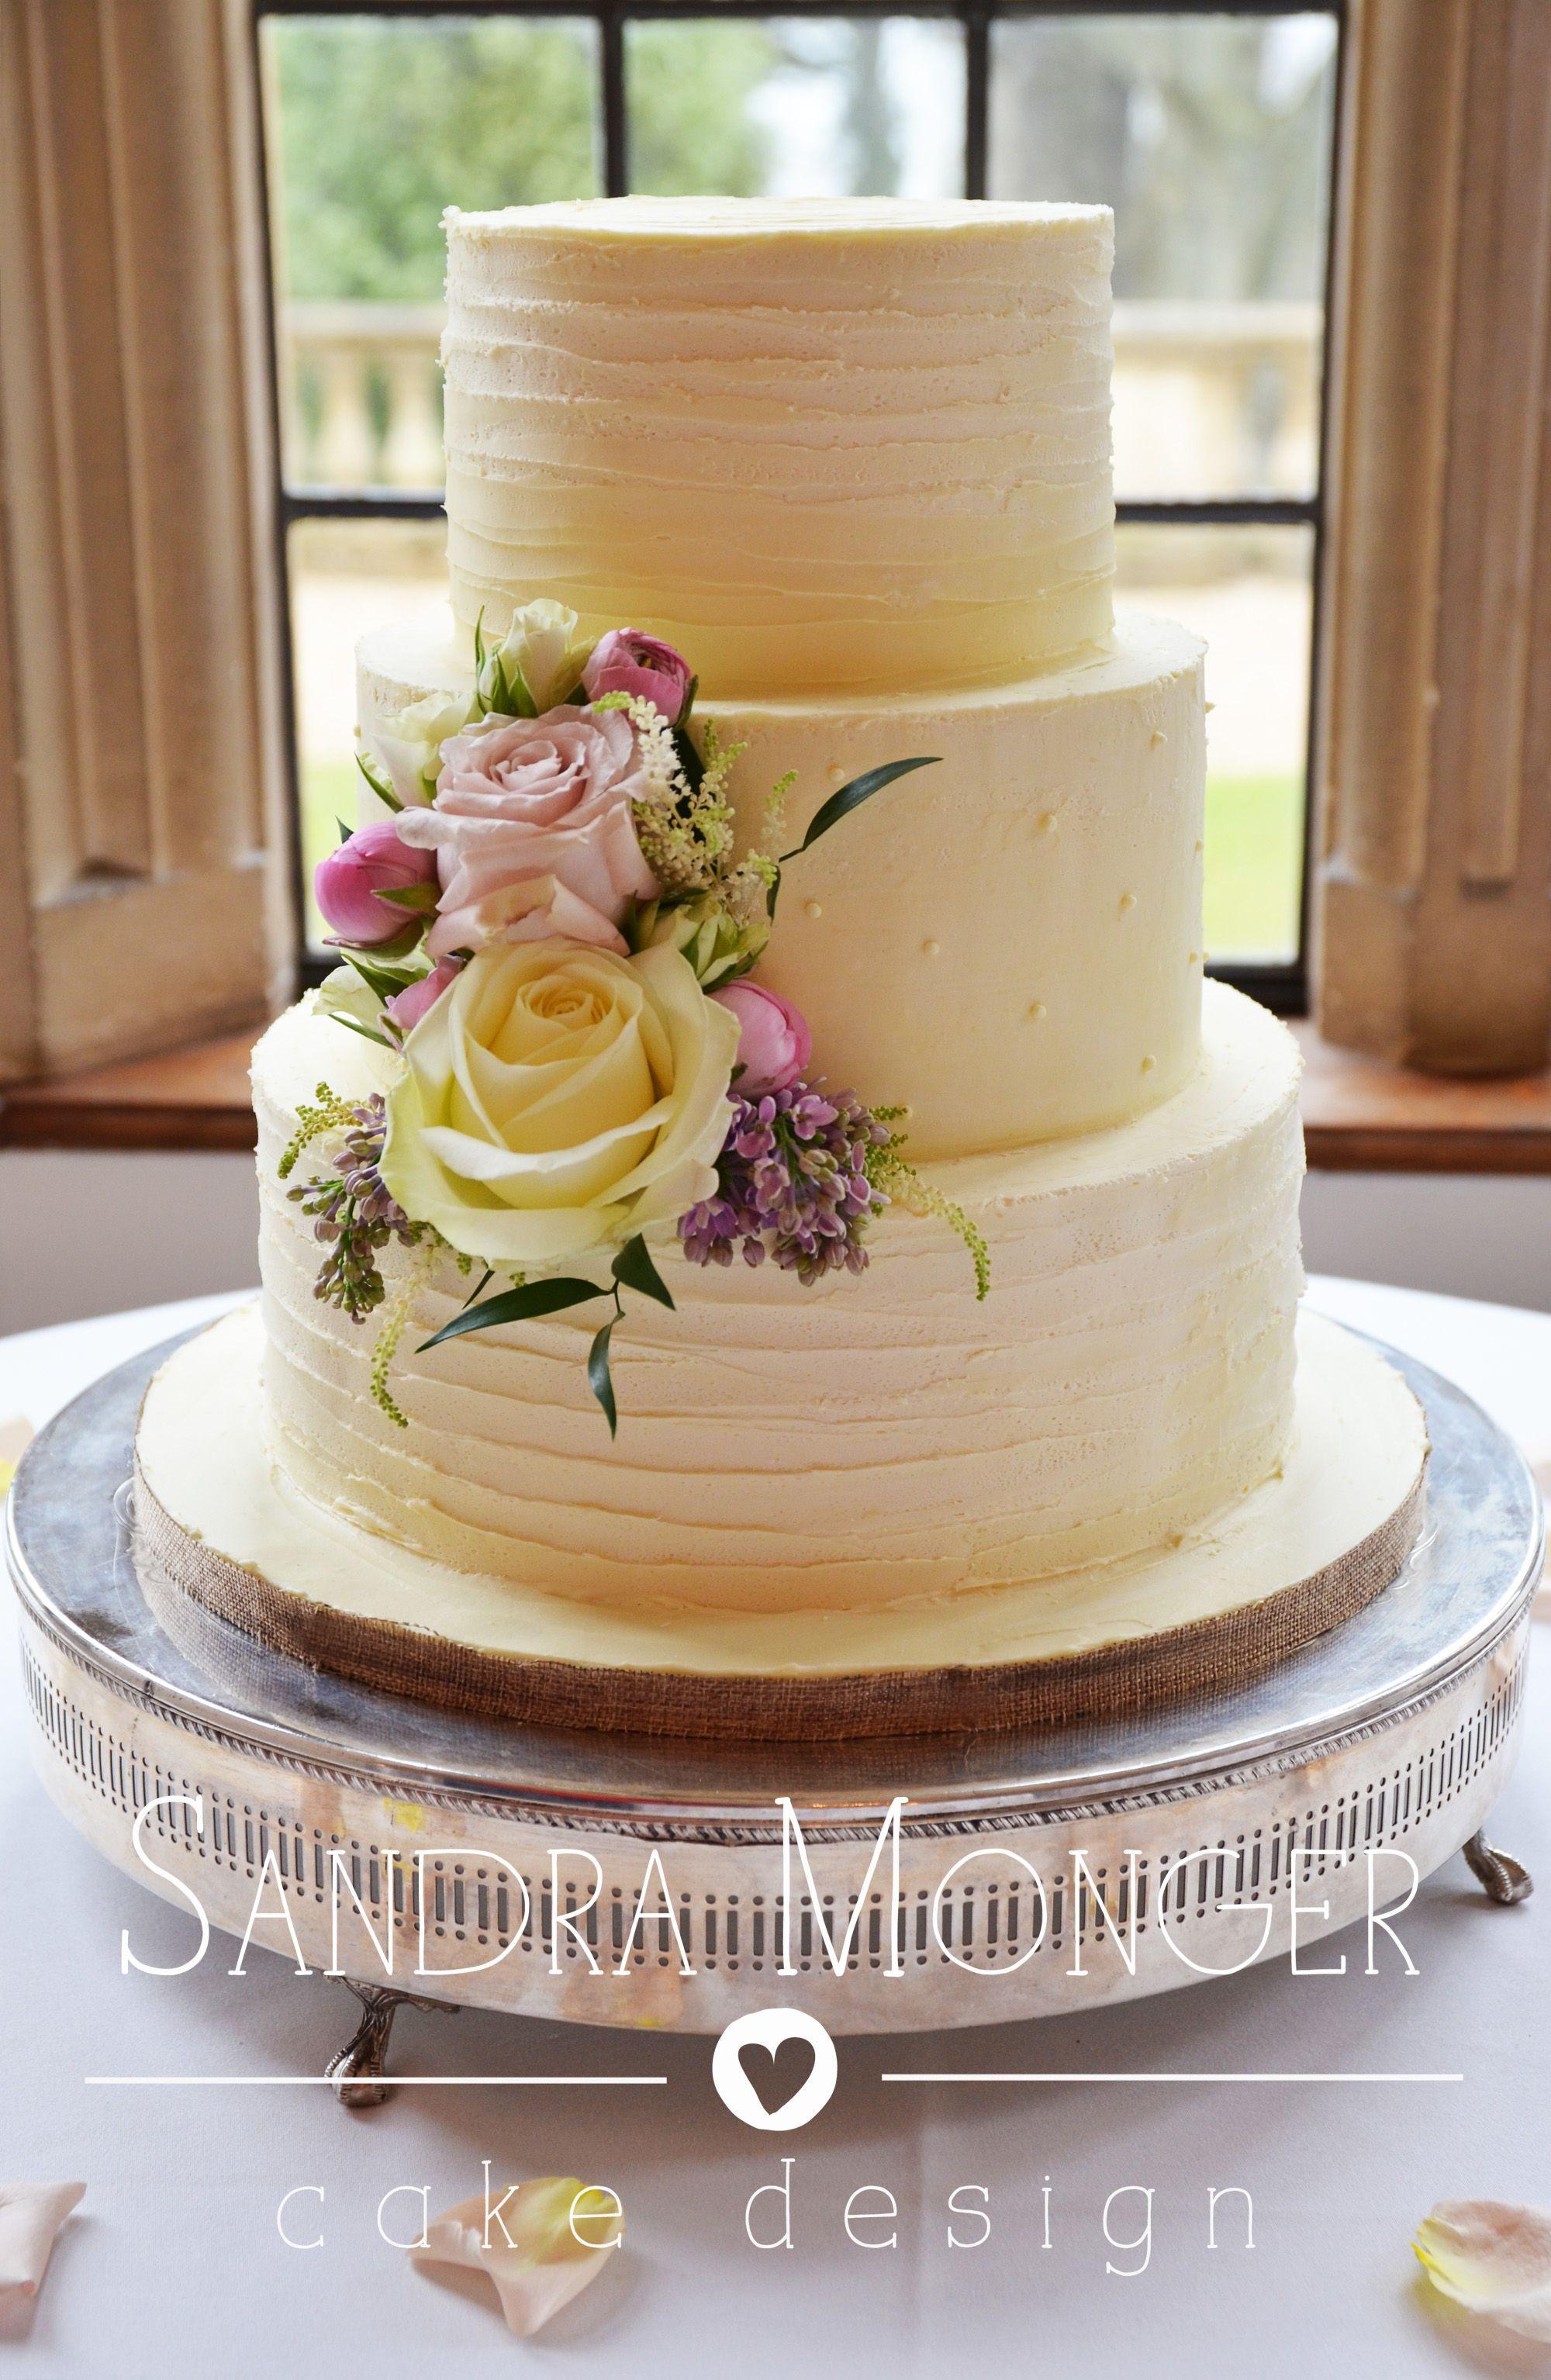 Chocolate Ganache Wedding Cakes  Rustic white chocolate ganache wedding cake